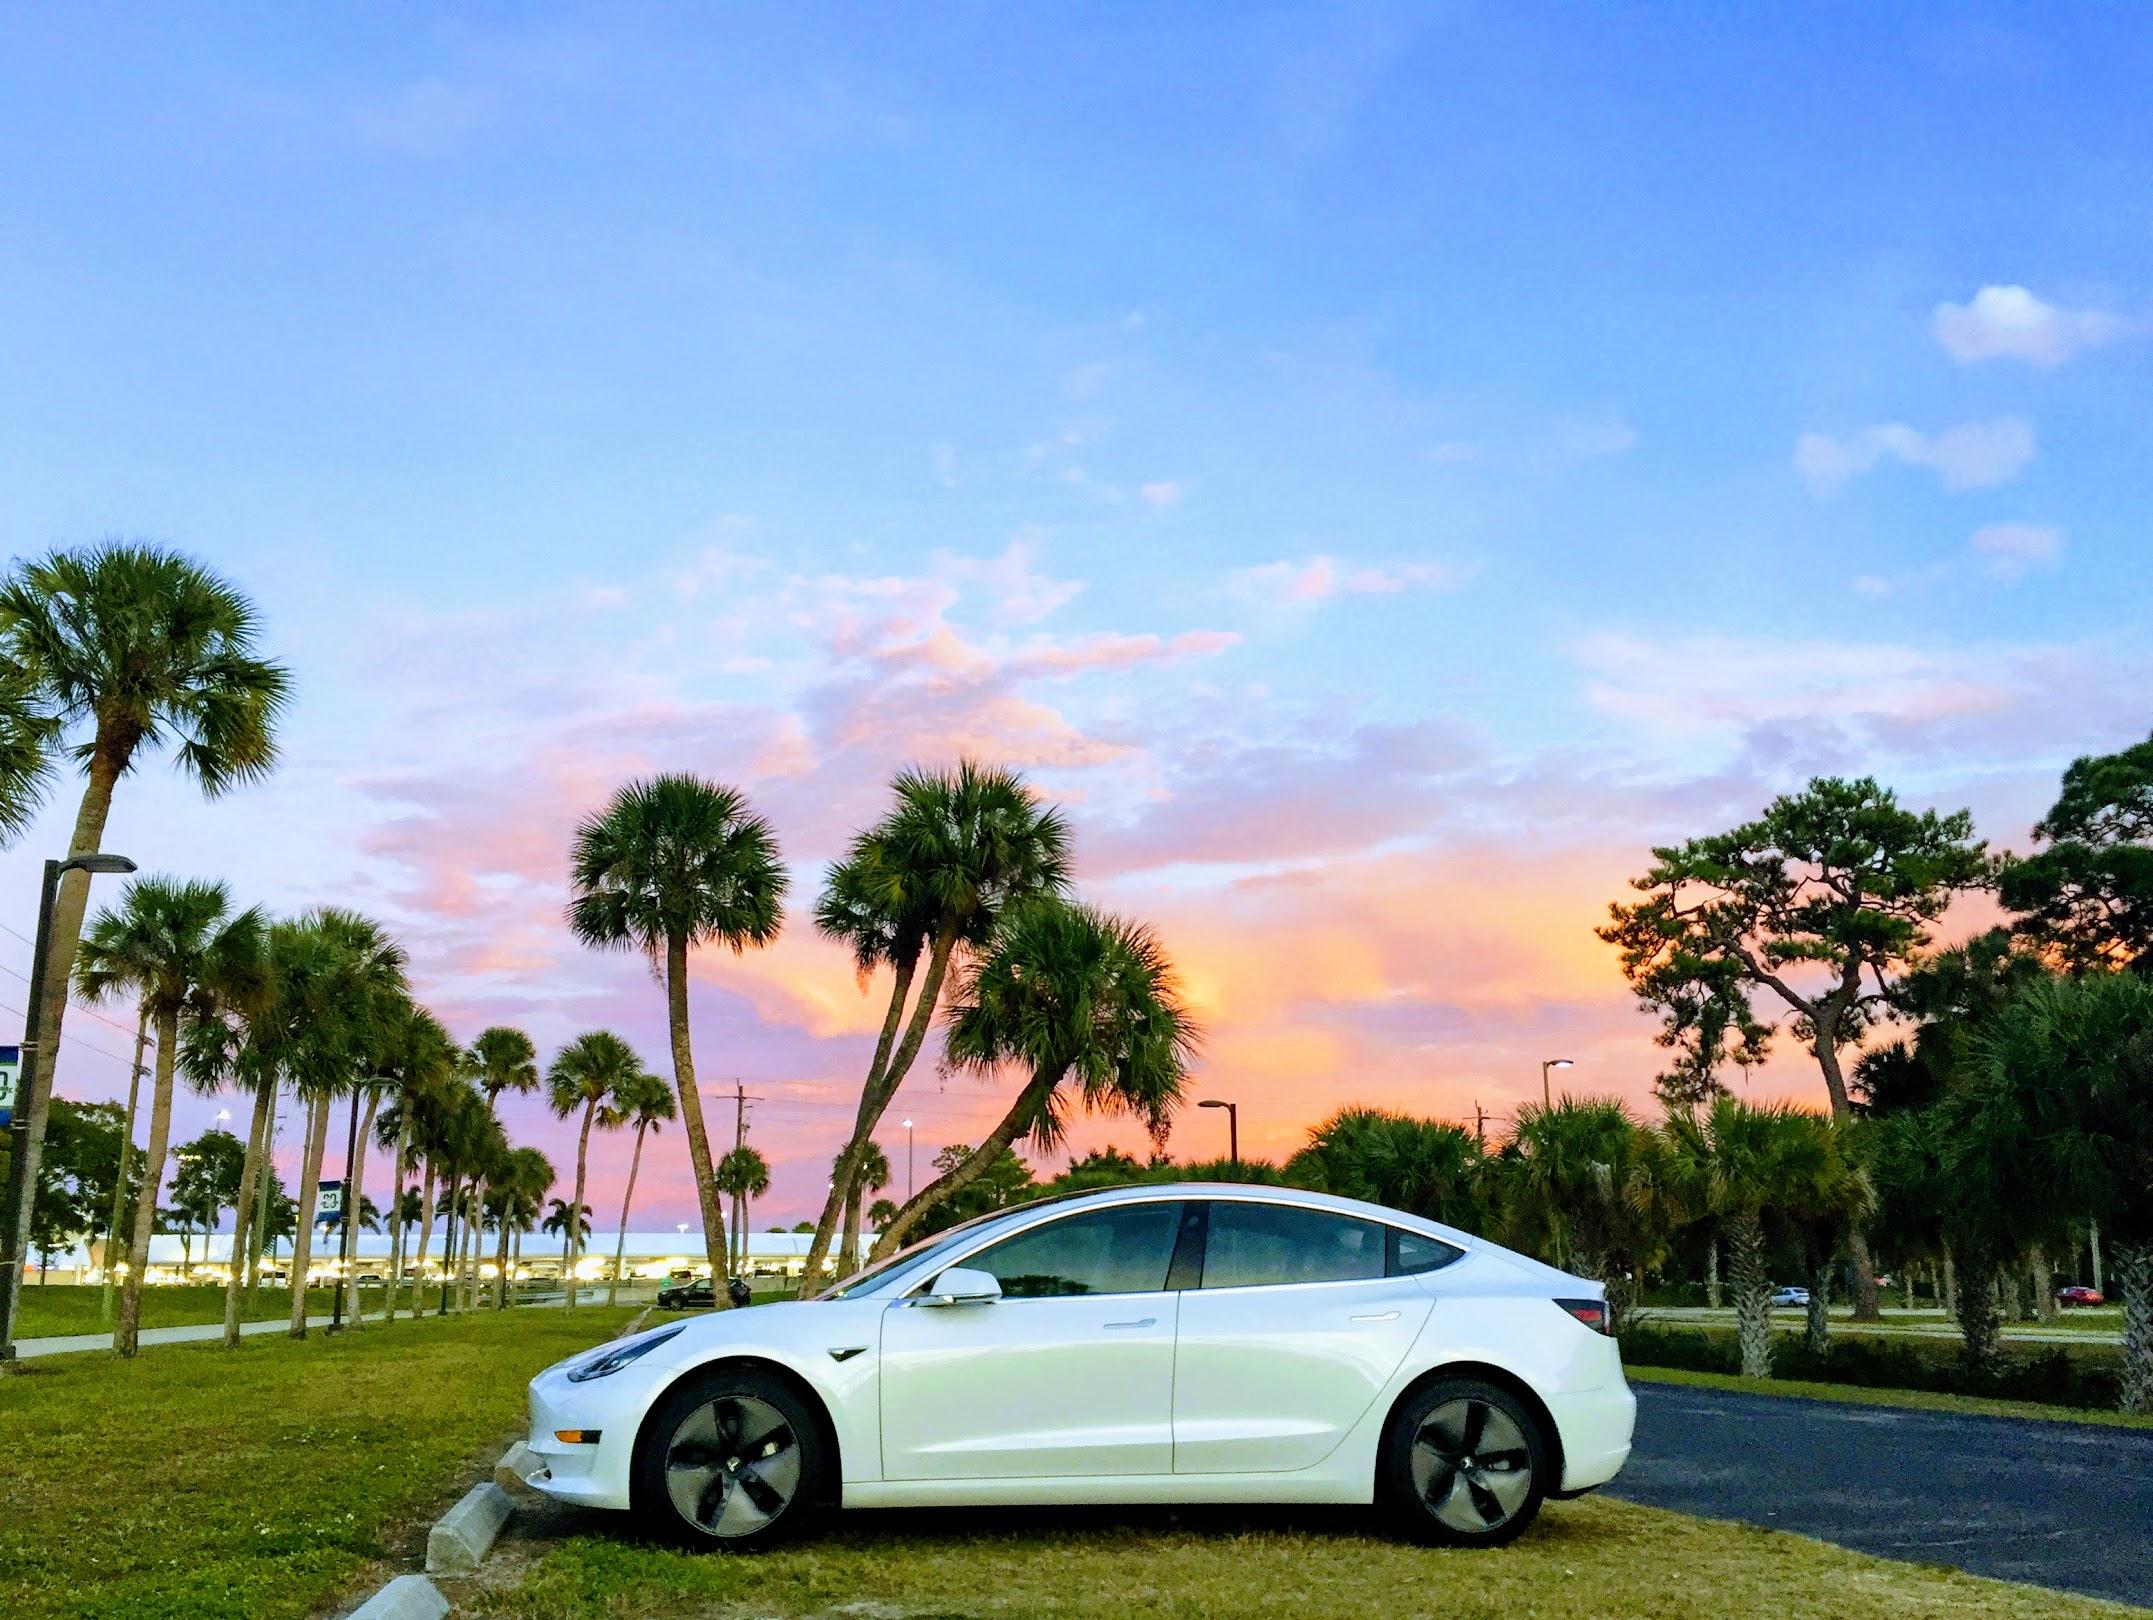 Tesla Model 3 in a Florida sunset